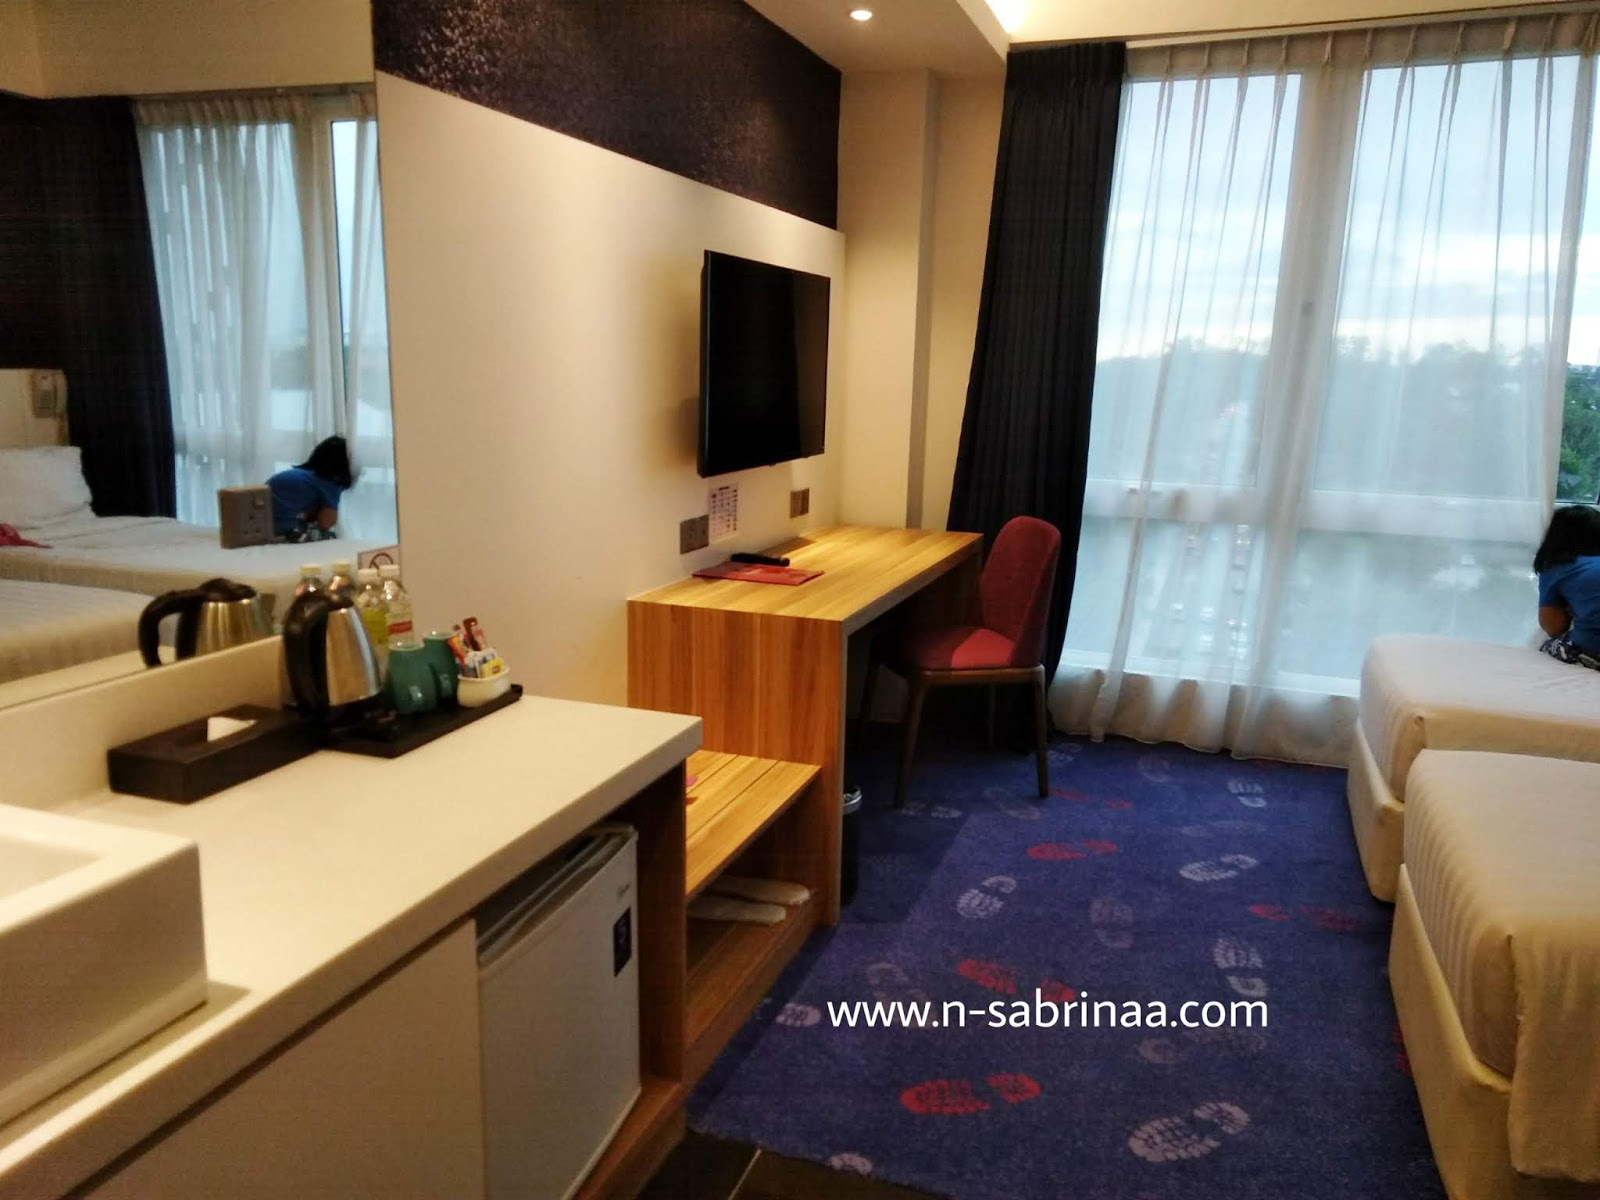 Pengalaman menginap hotel Amerin Johor Bahru